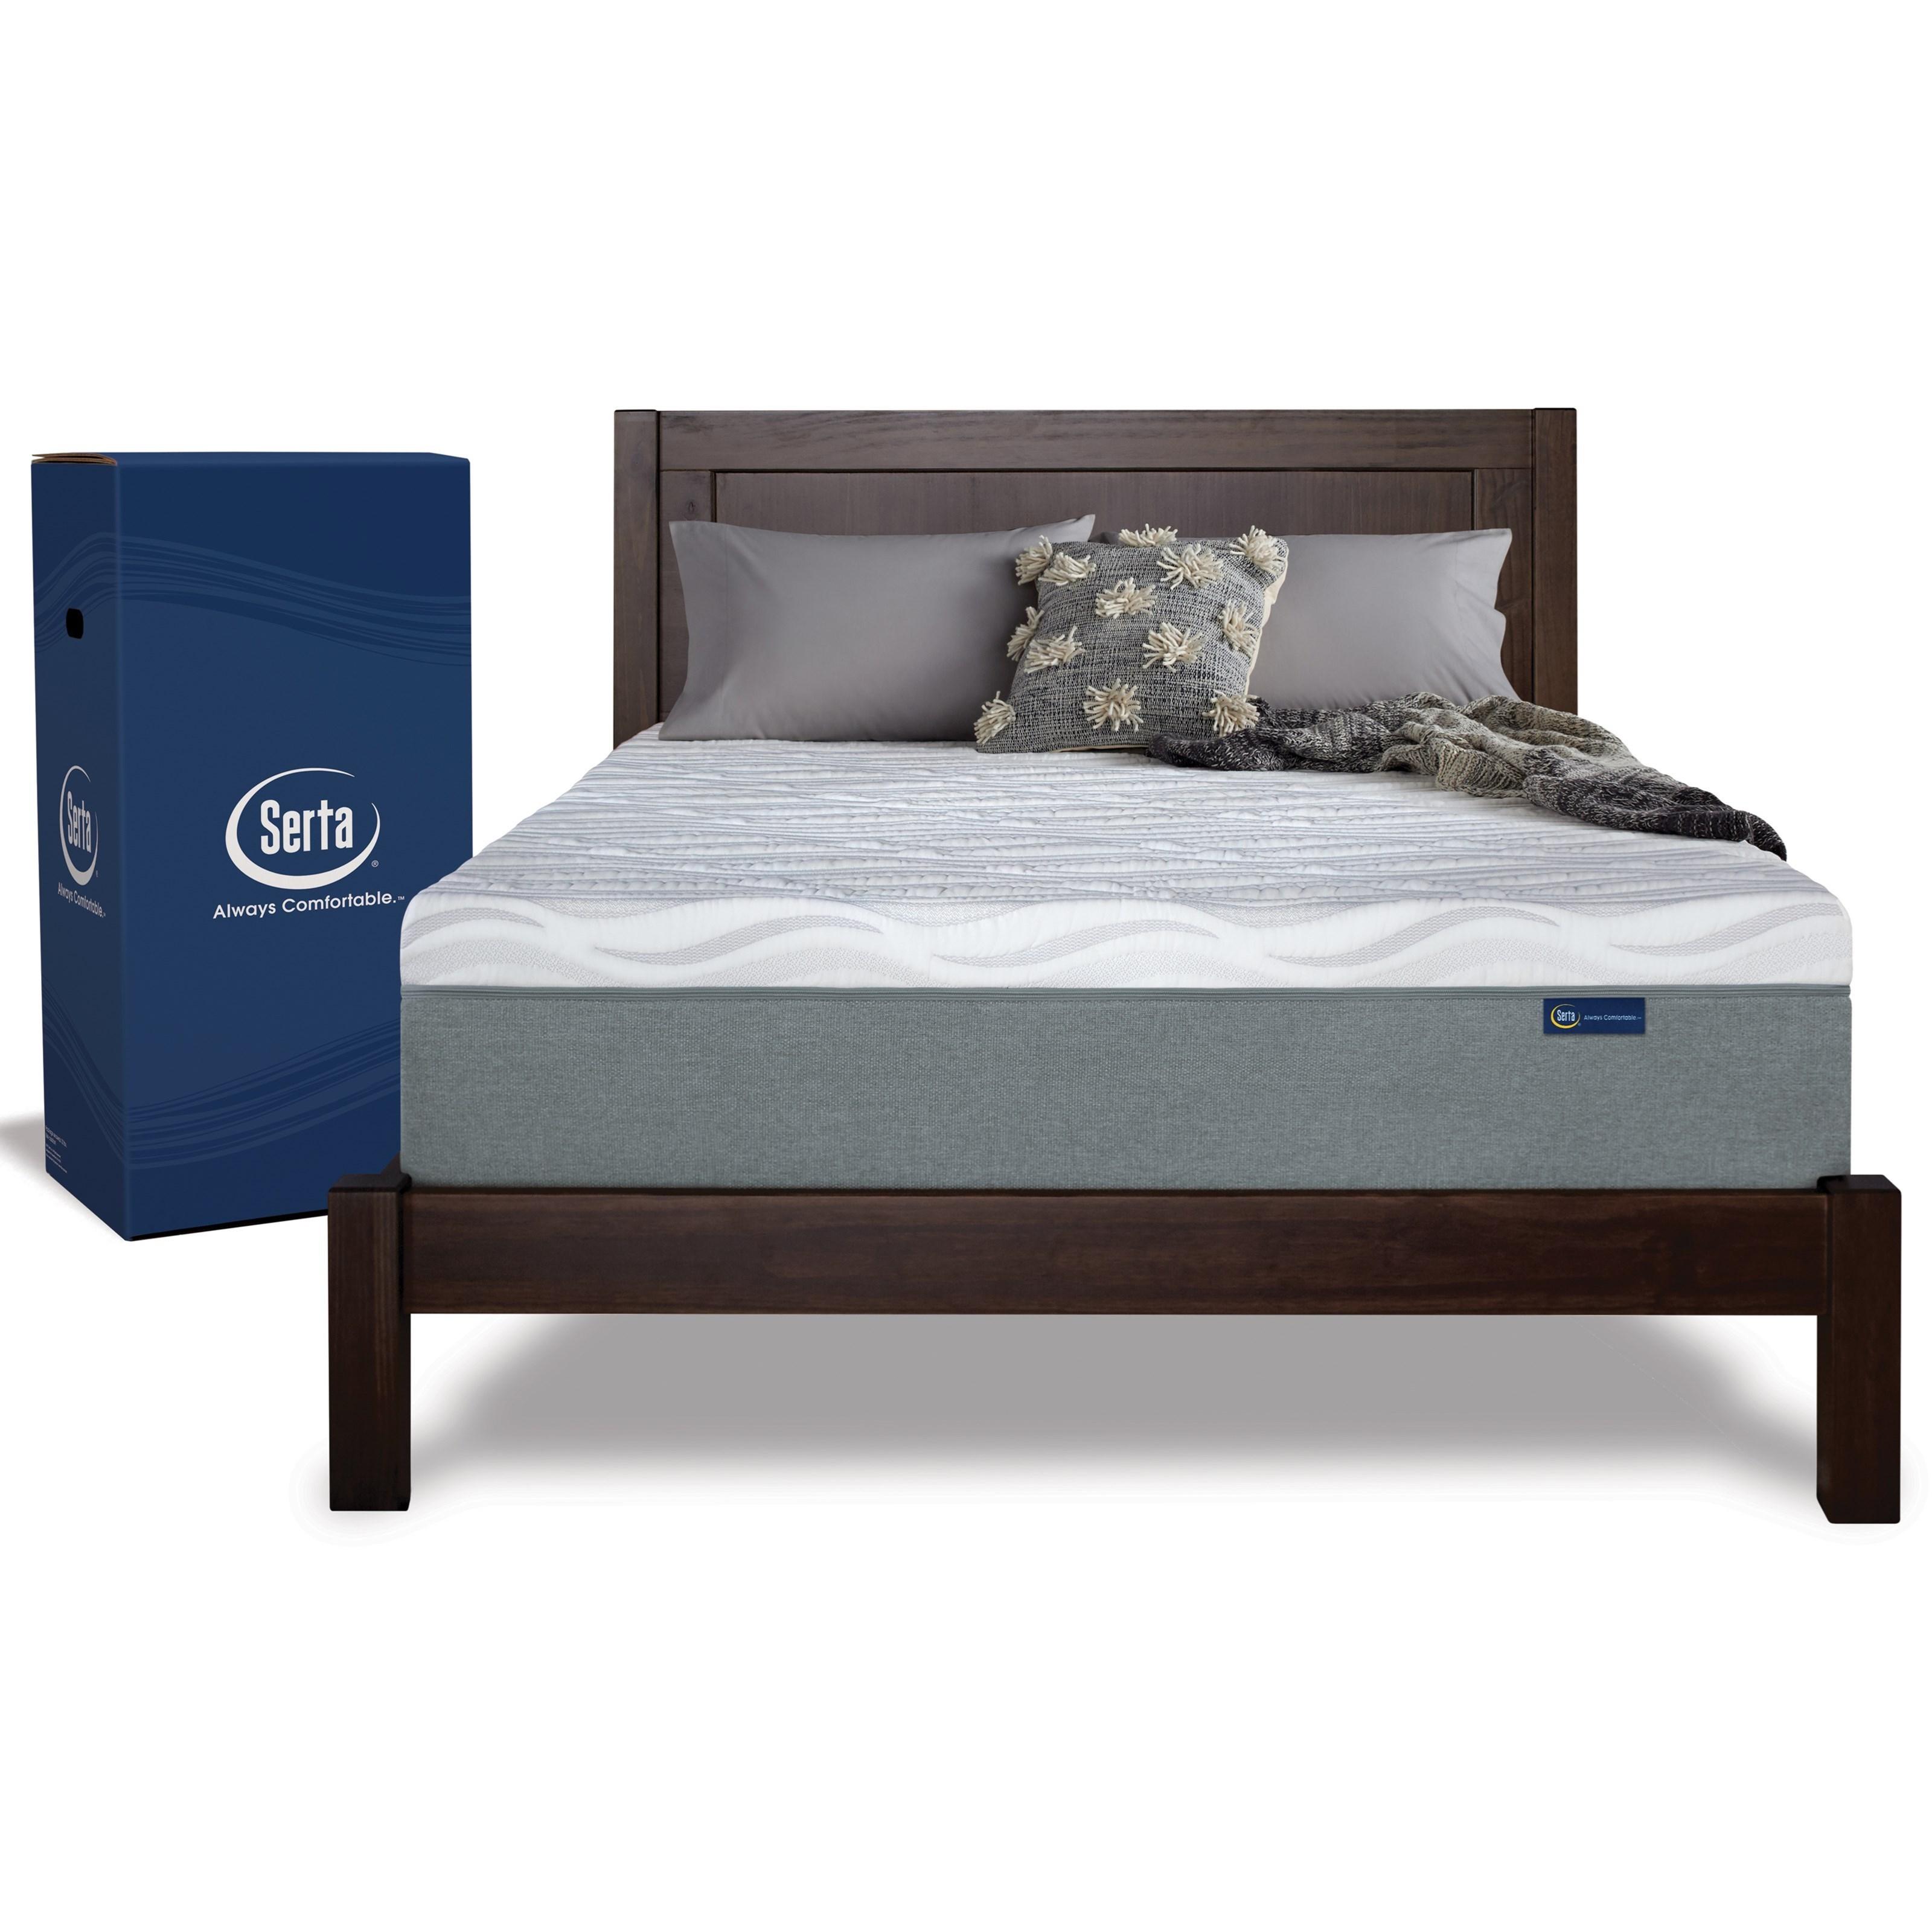 Premium Serta Full Firm Mattress in a Box by Serta at HomeWorld Furniture